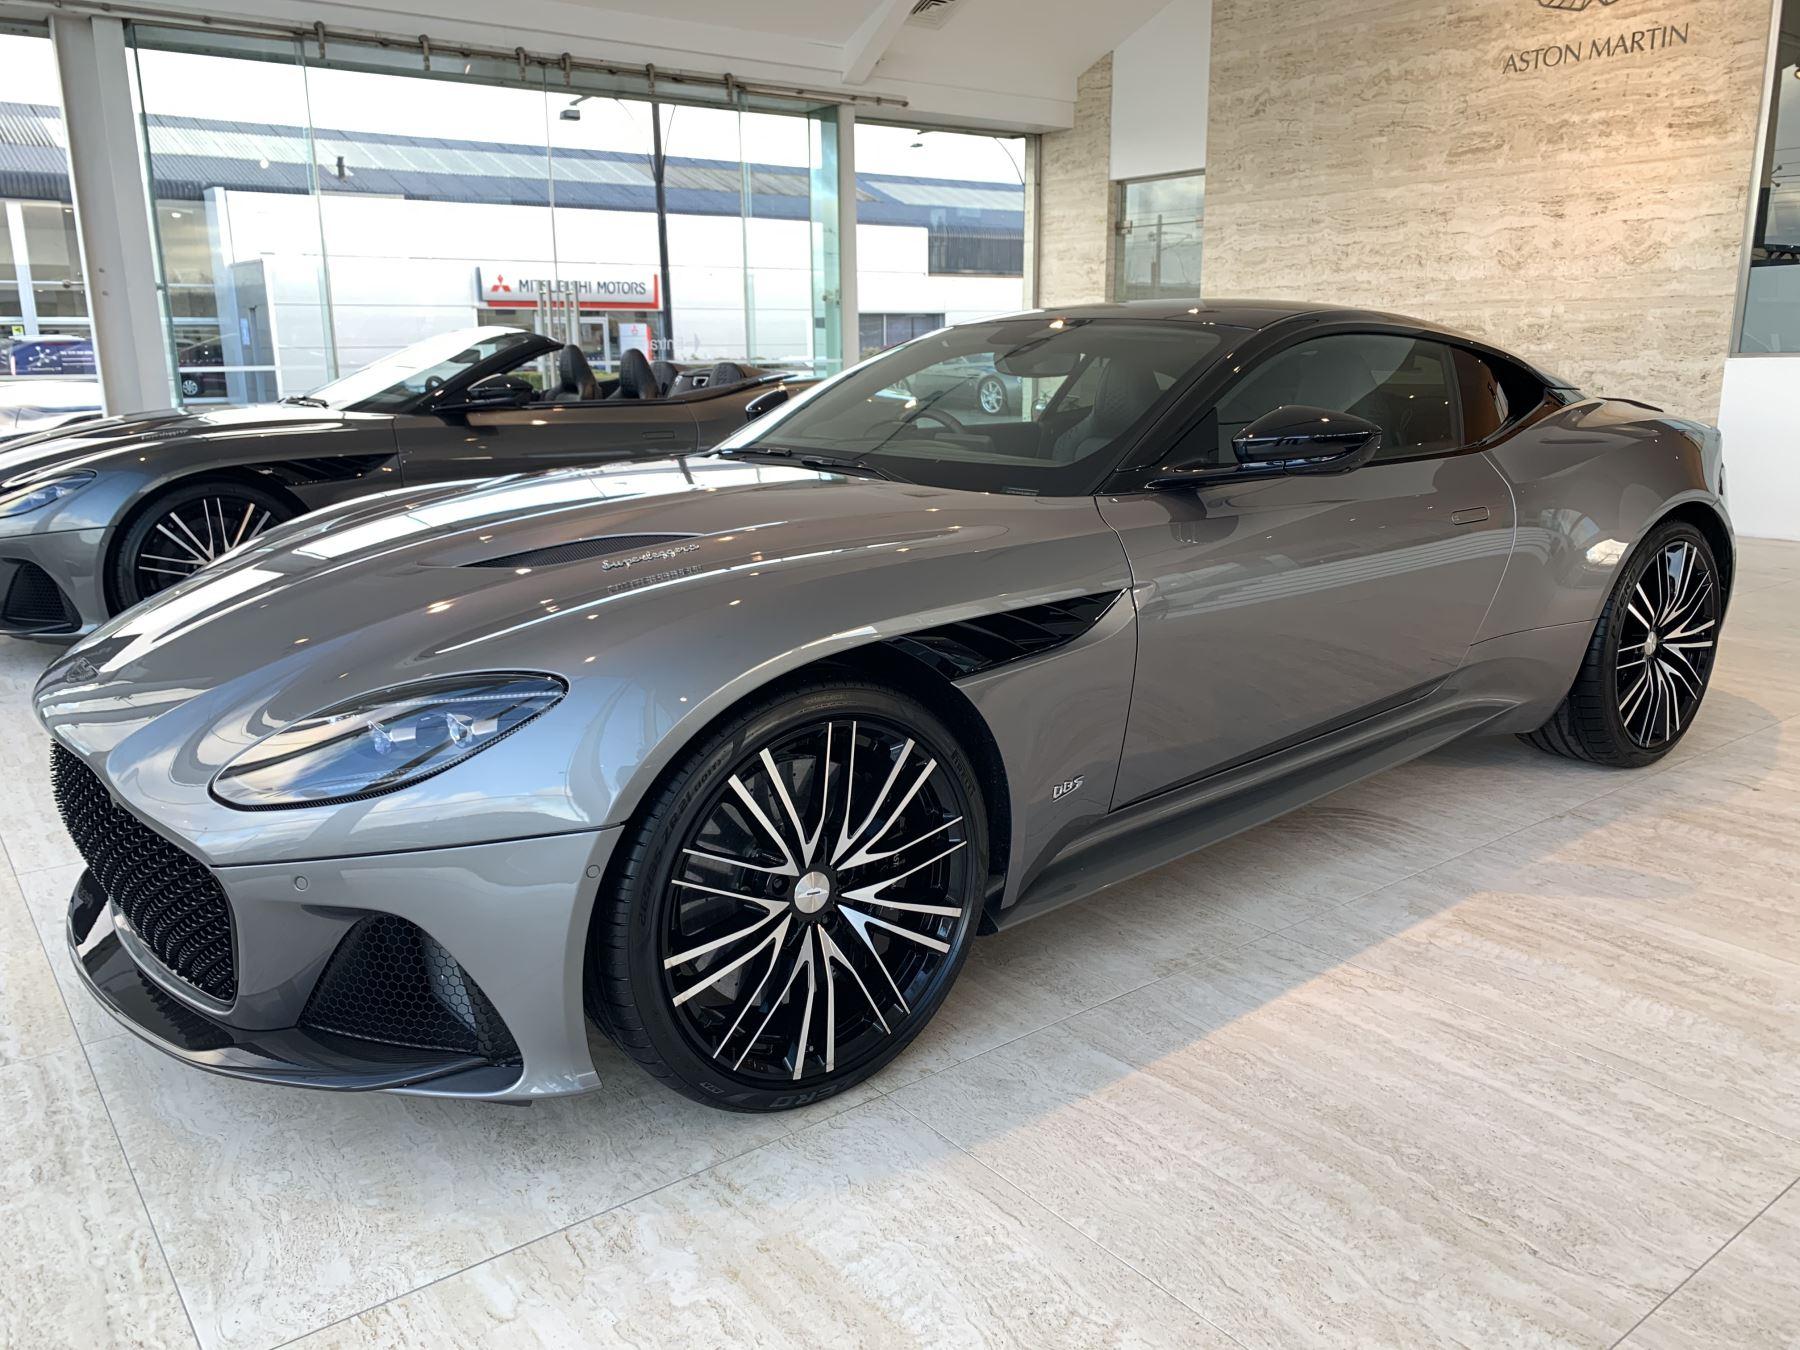 Aston Martin DBS Superleggera V12 Superleggera 2dr Touchtronic Auto image 8